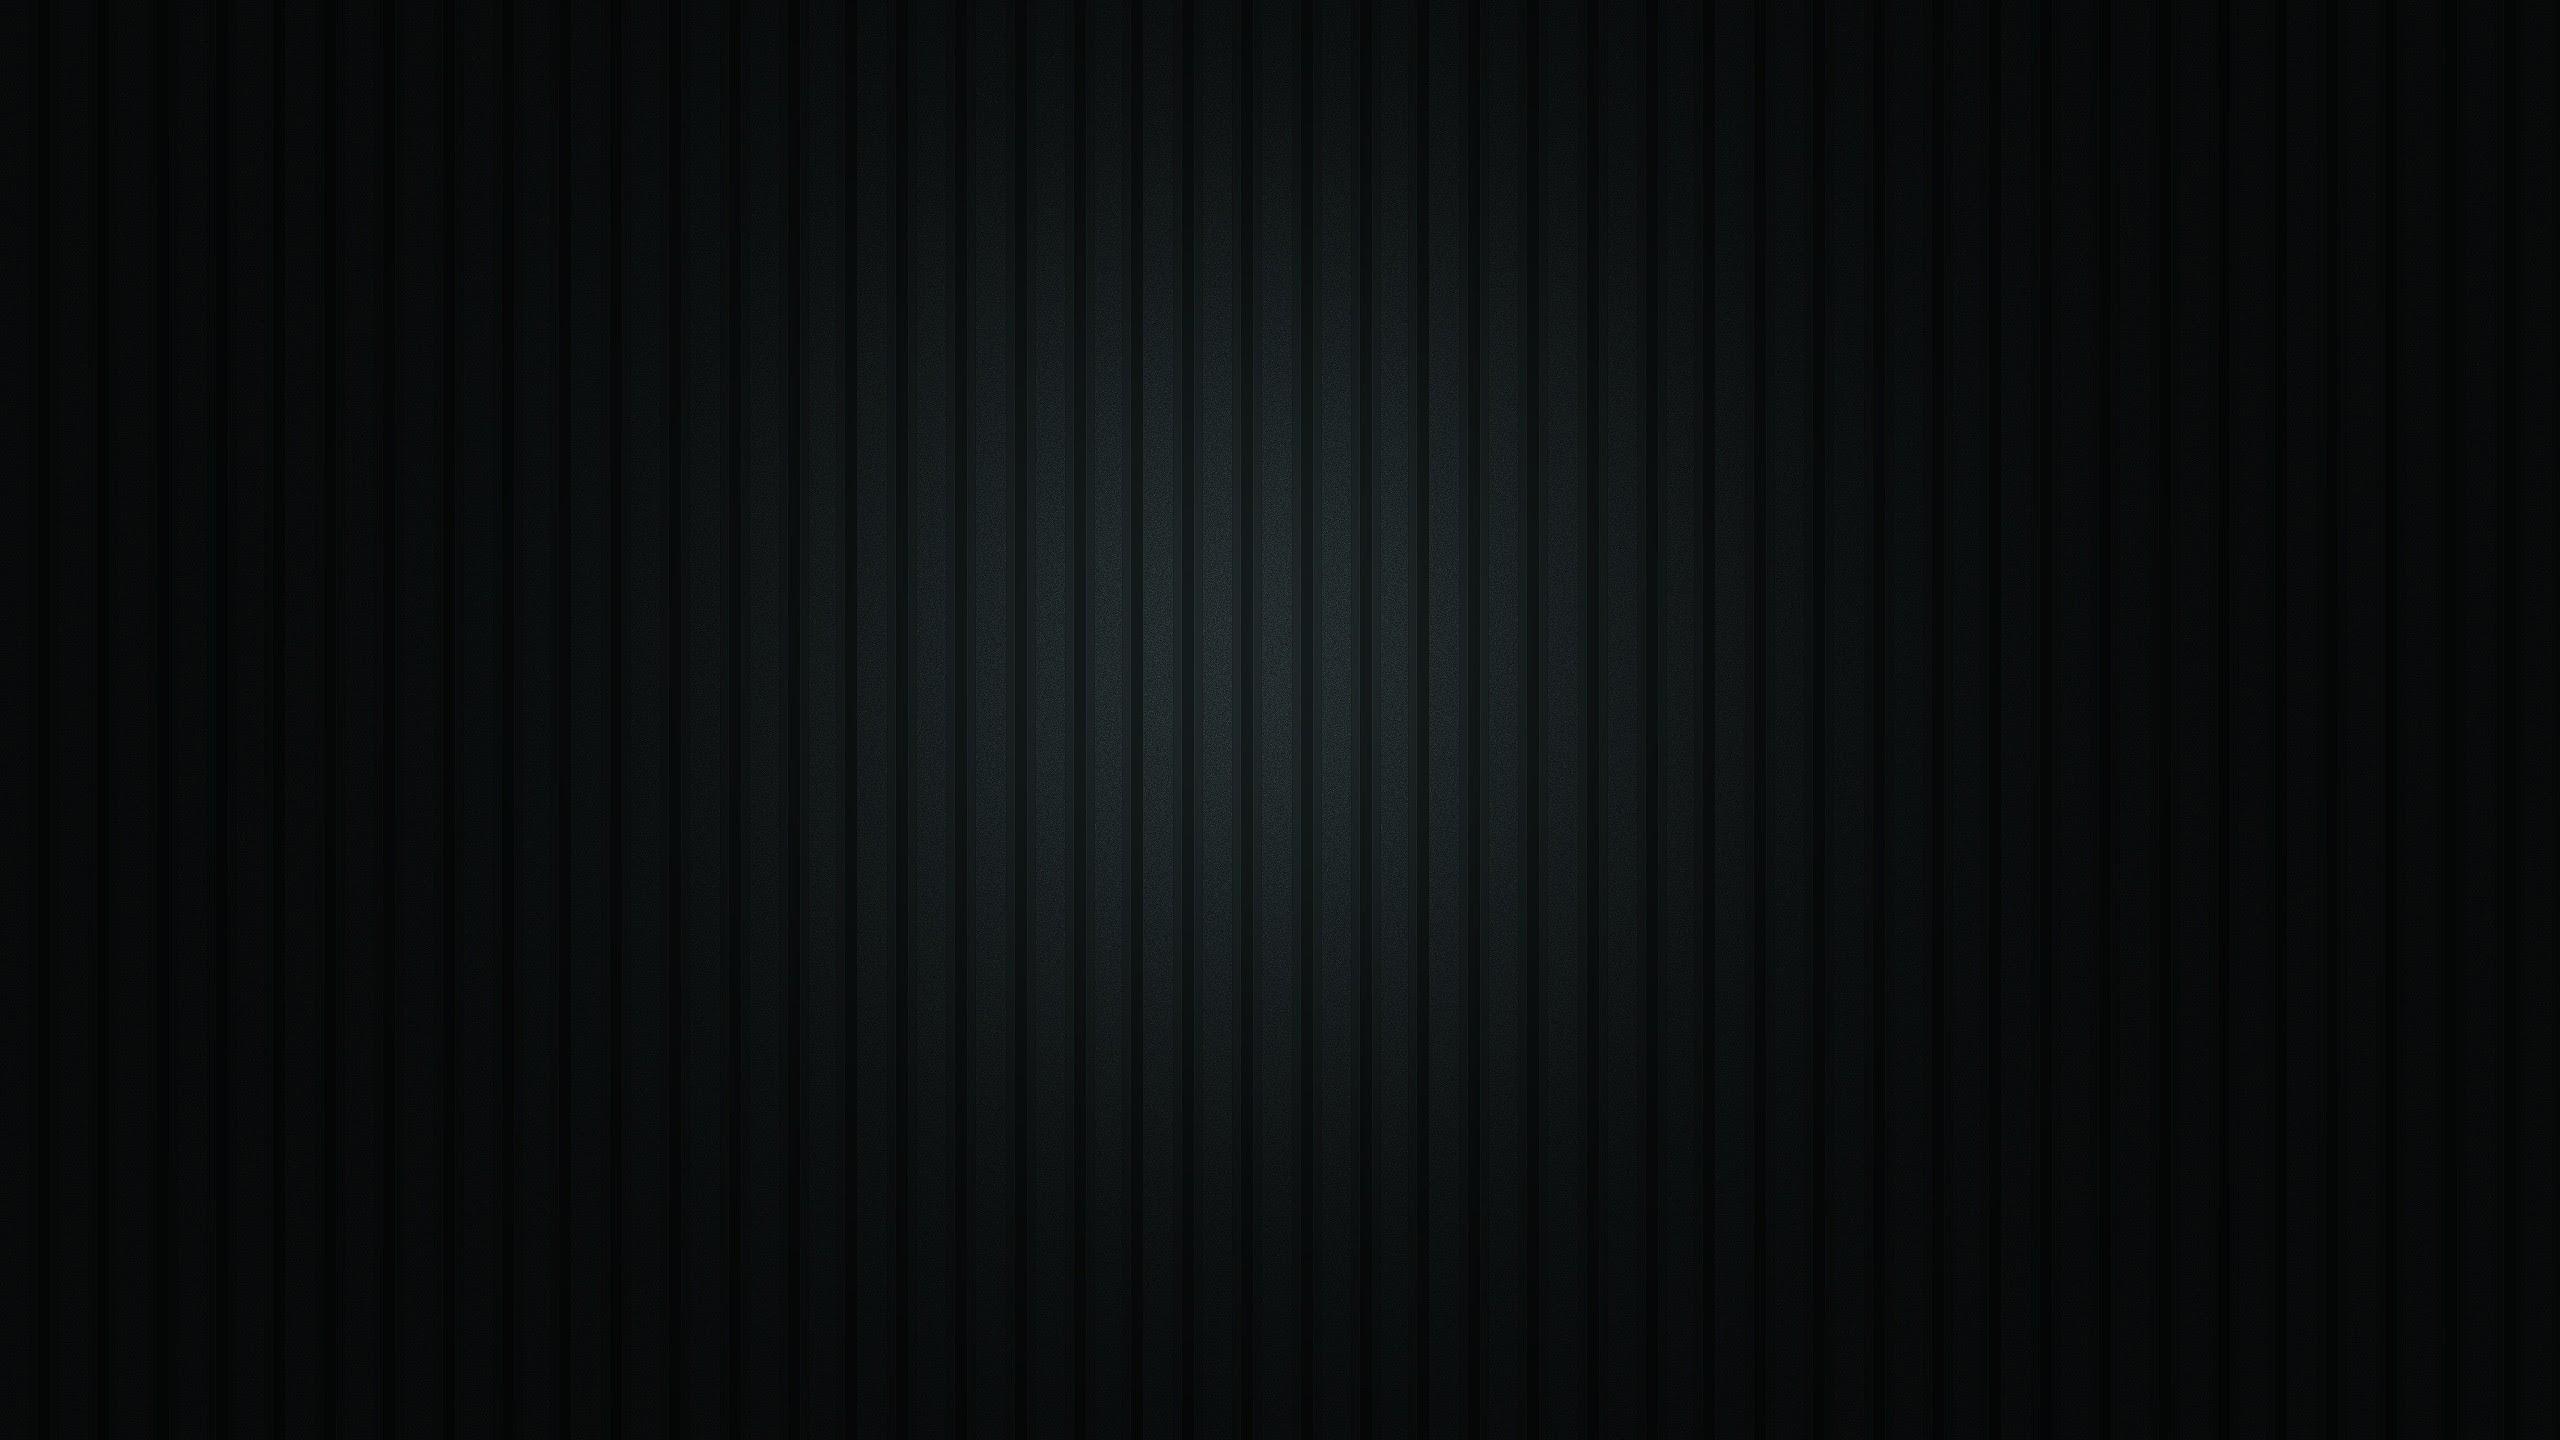 Plain Black Wallpapers HD (74+ images)